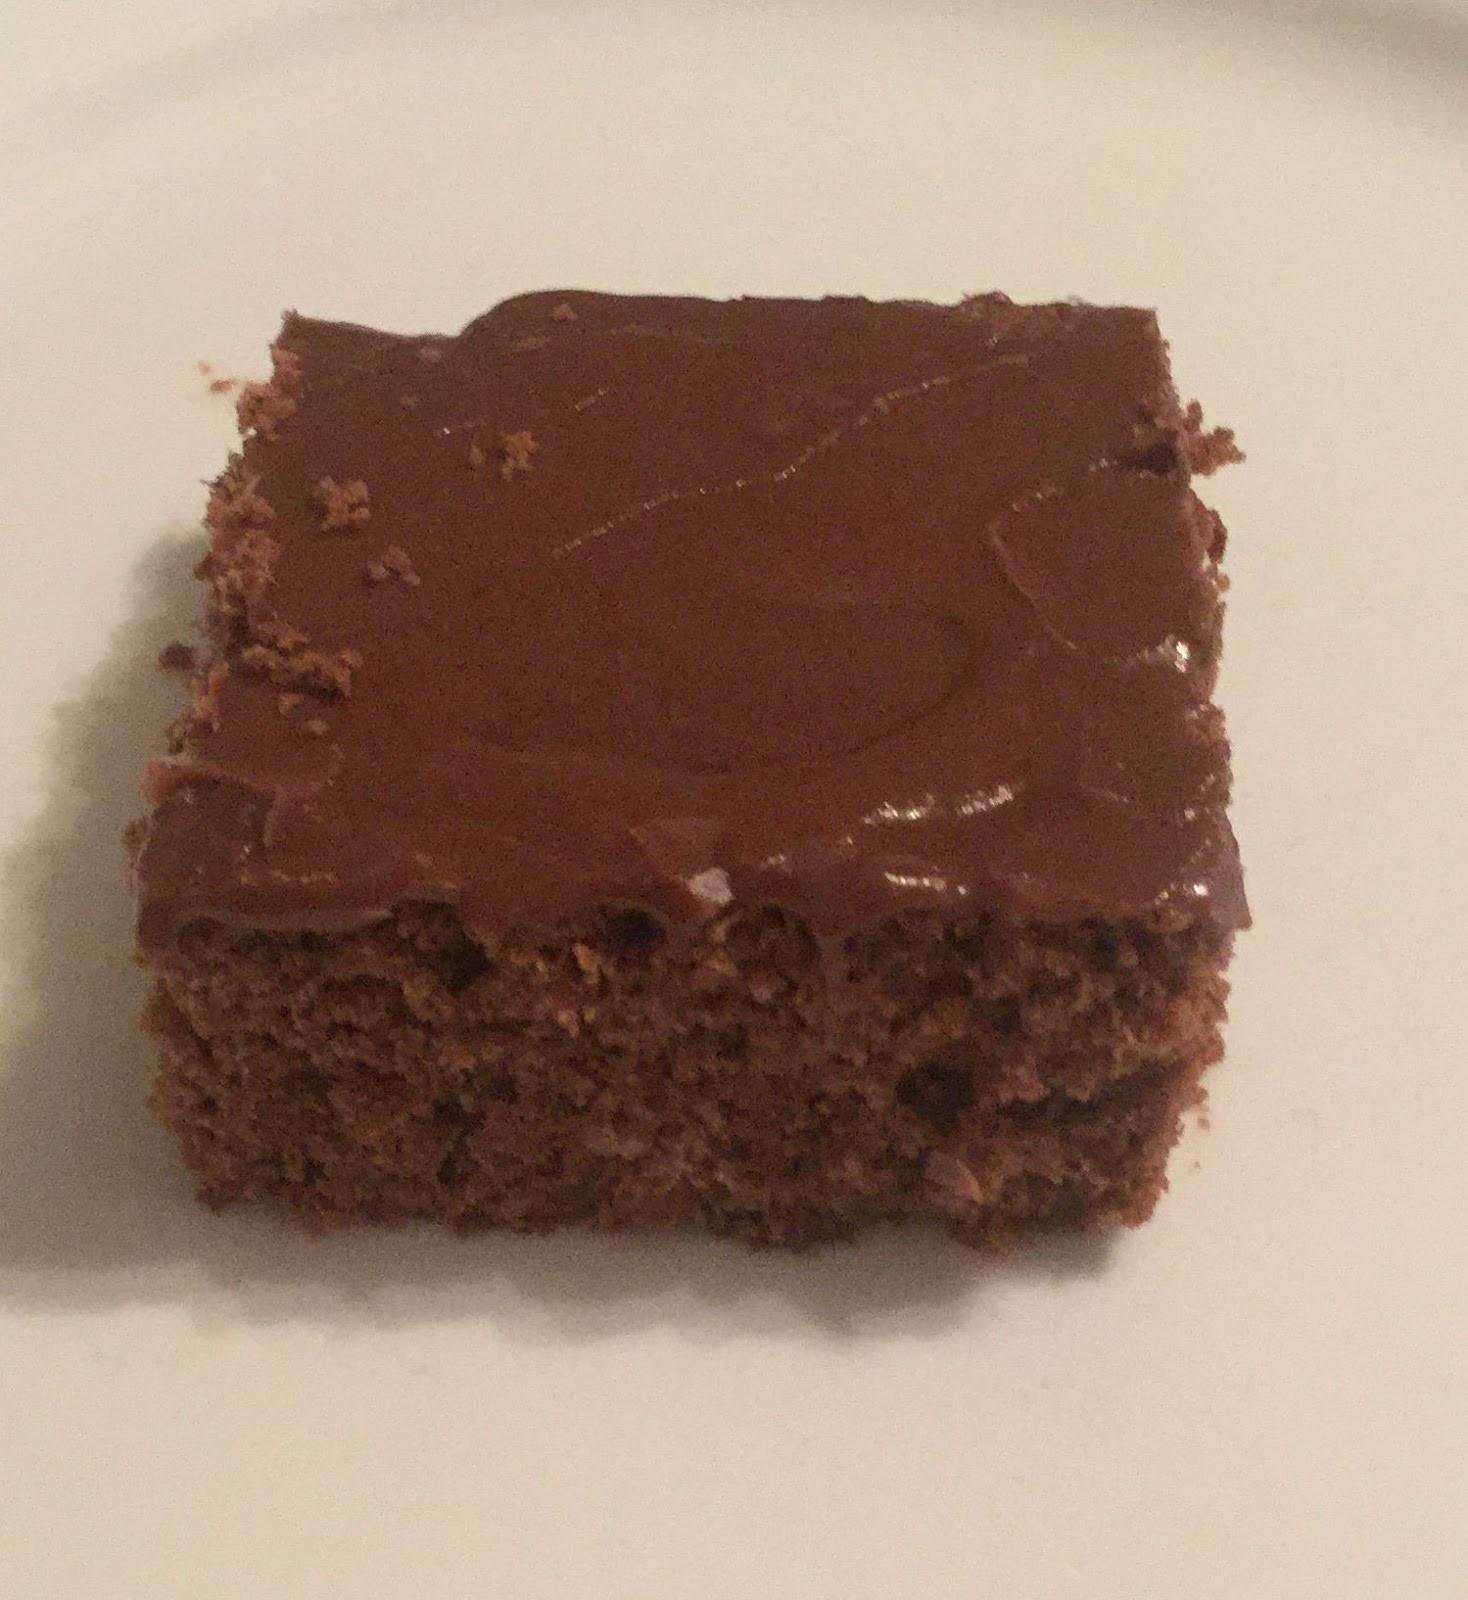 Cake Like Brownies  Countrified Hicks Cake like Brownies